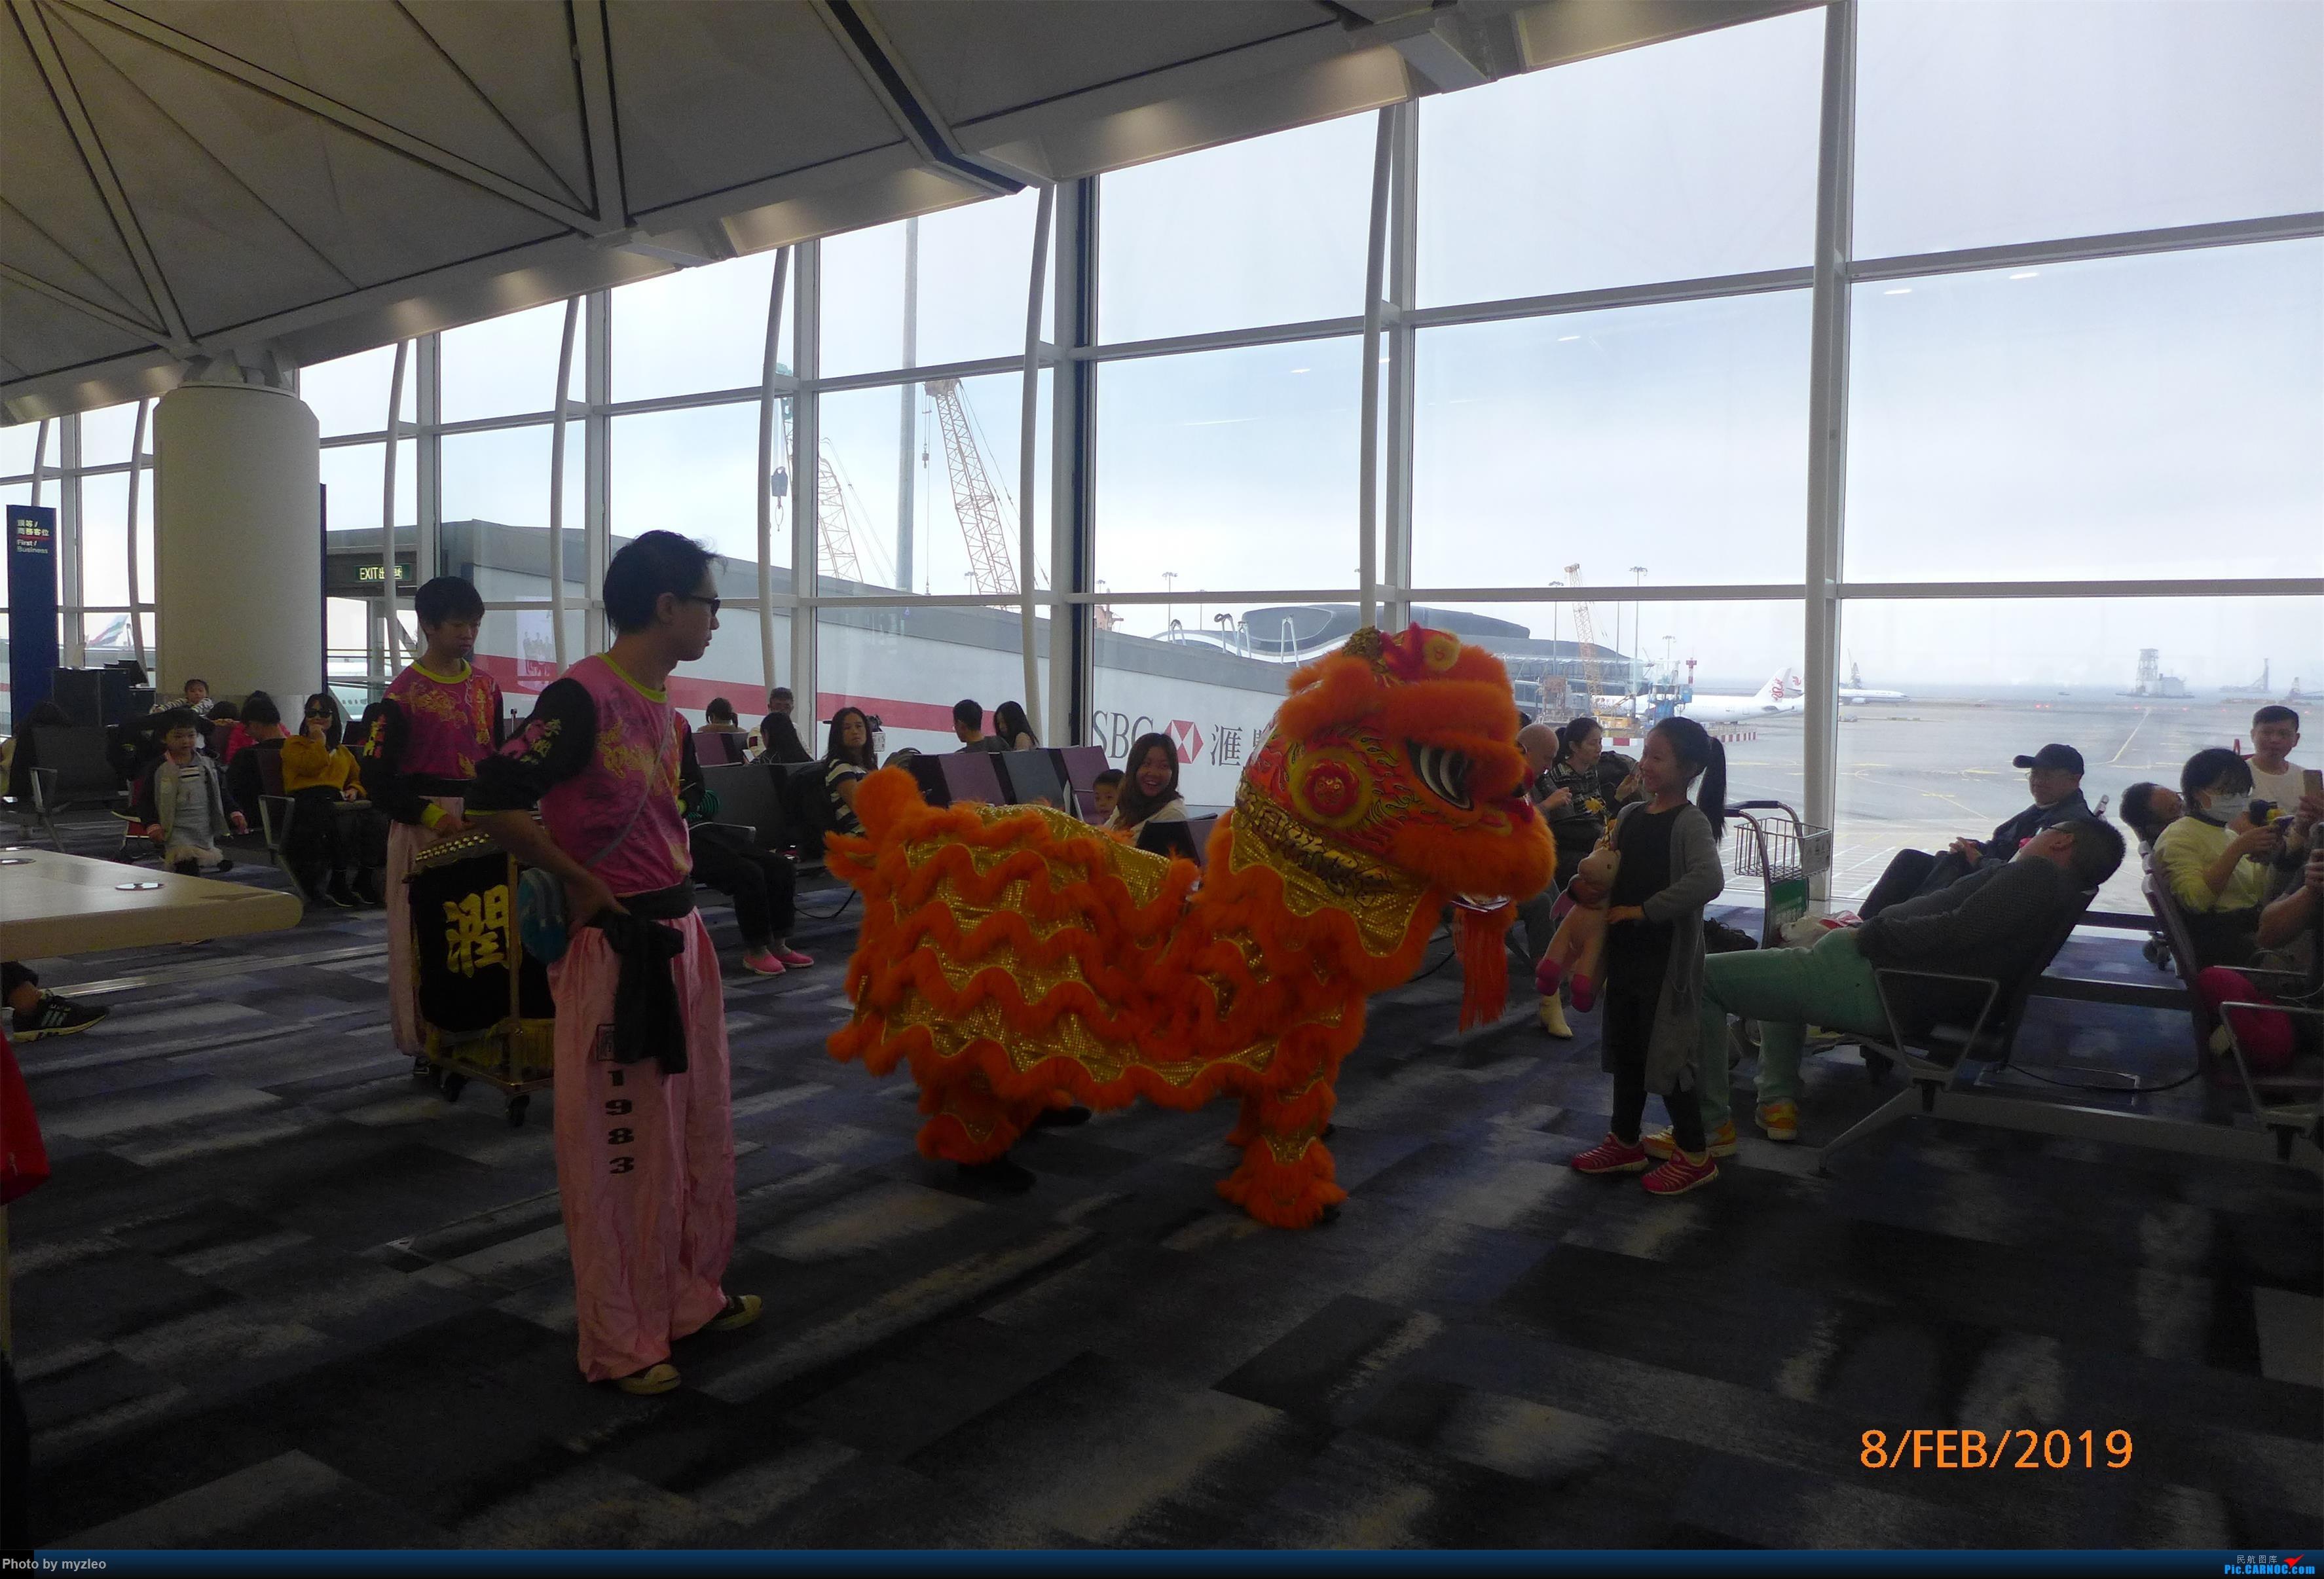 Re:[原创]【myzleo的游记4.5】十年之约(5)在香港的最后一天,搭乘港航333回沪 AIRBUS A380-800 VH-OQI 中国香港国际机场 中国香港国际机场